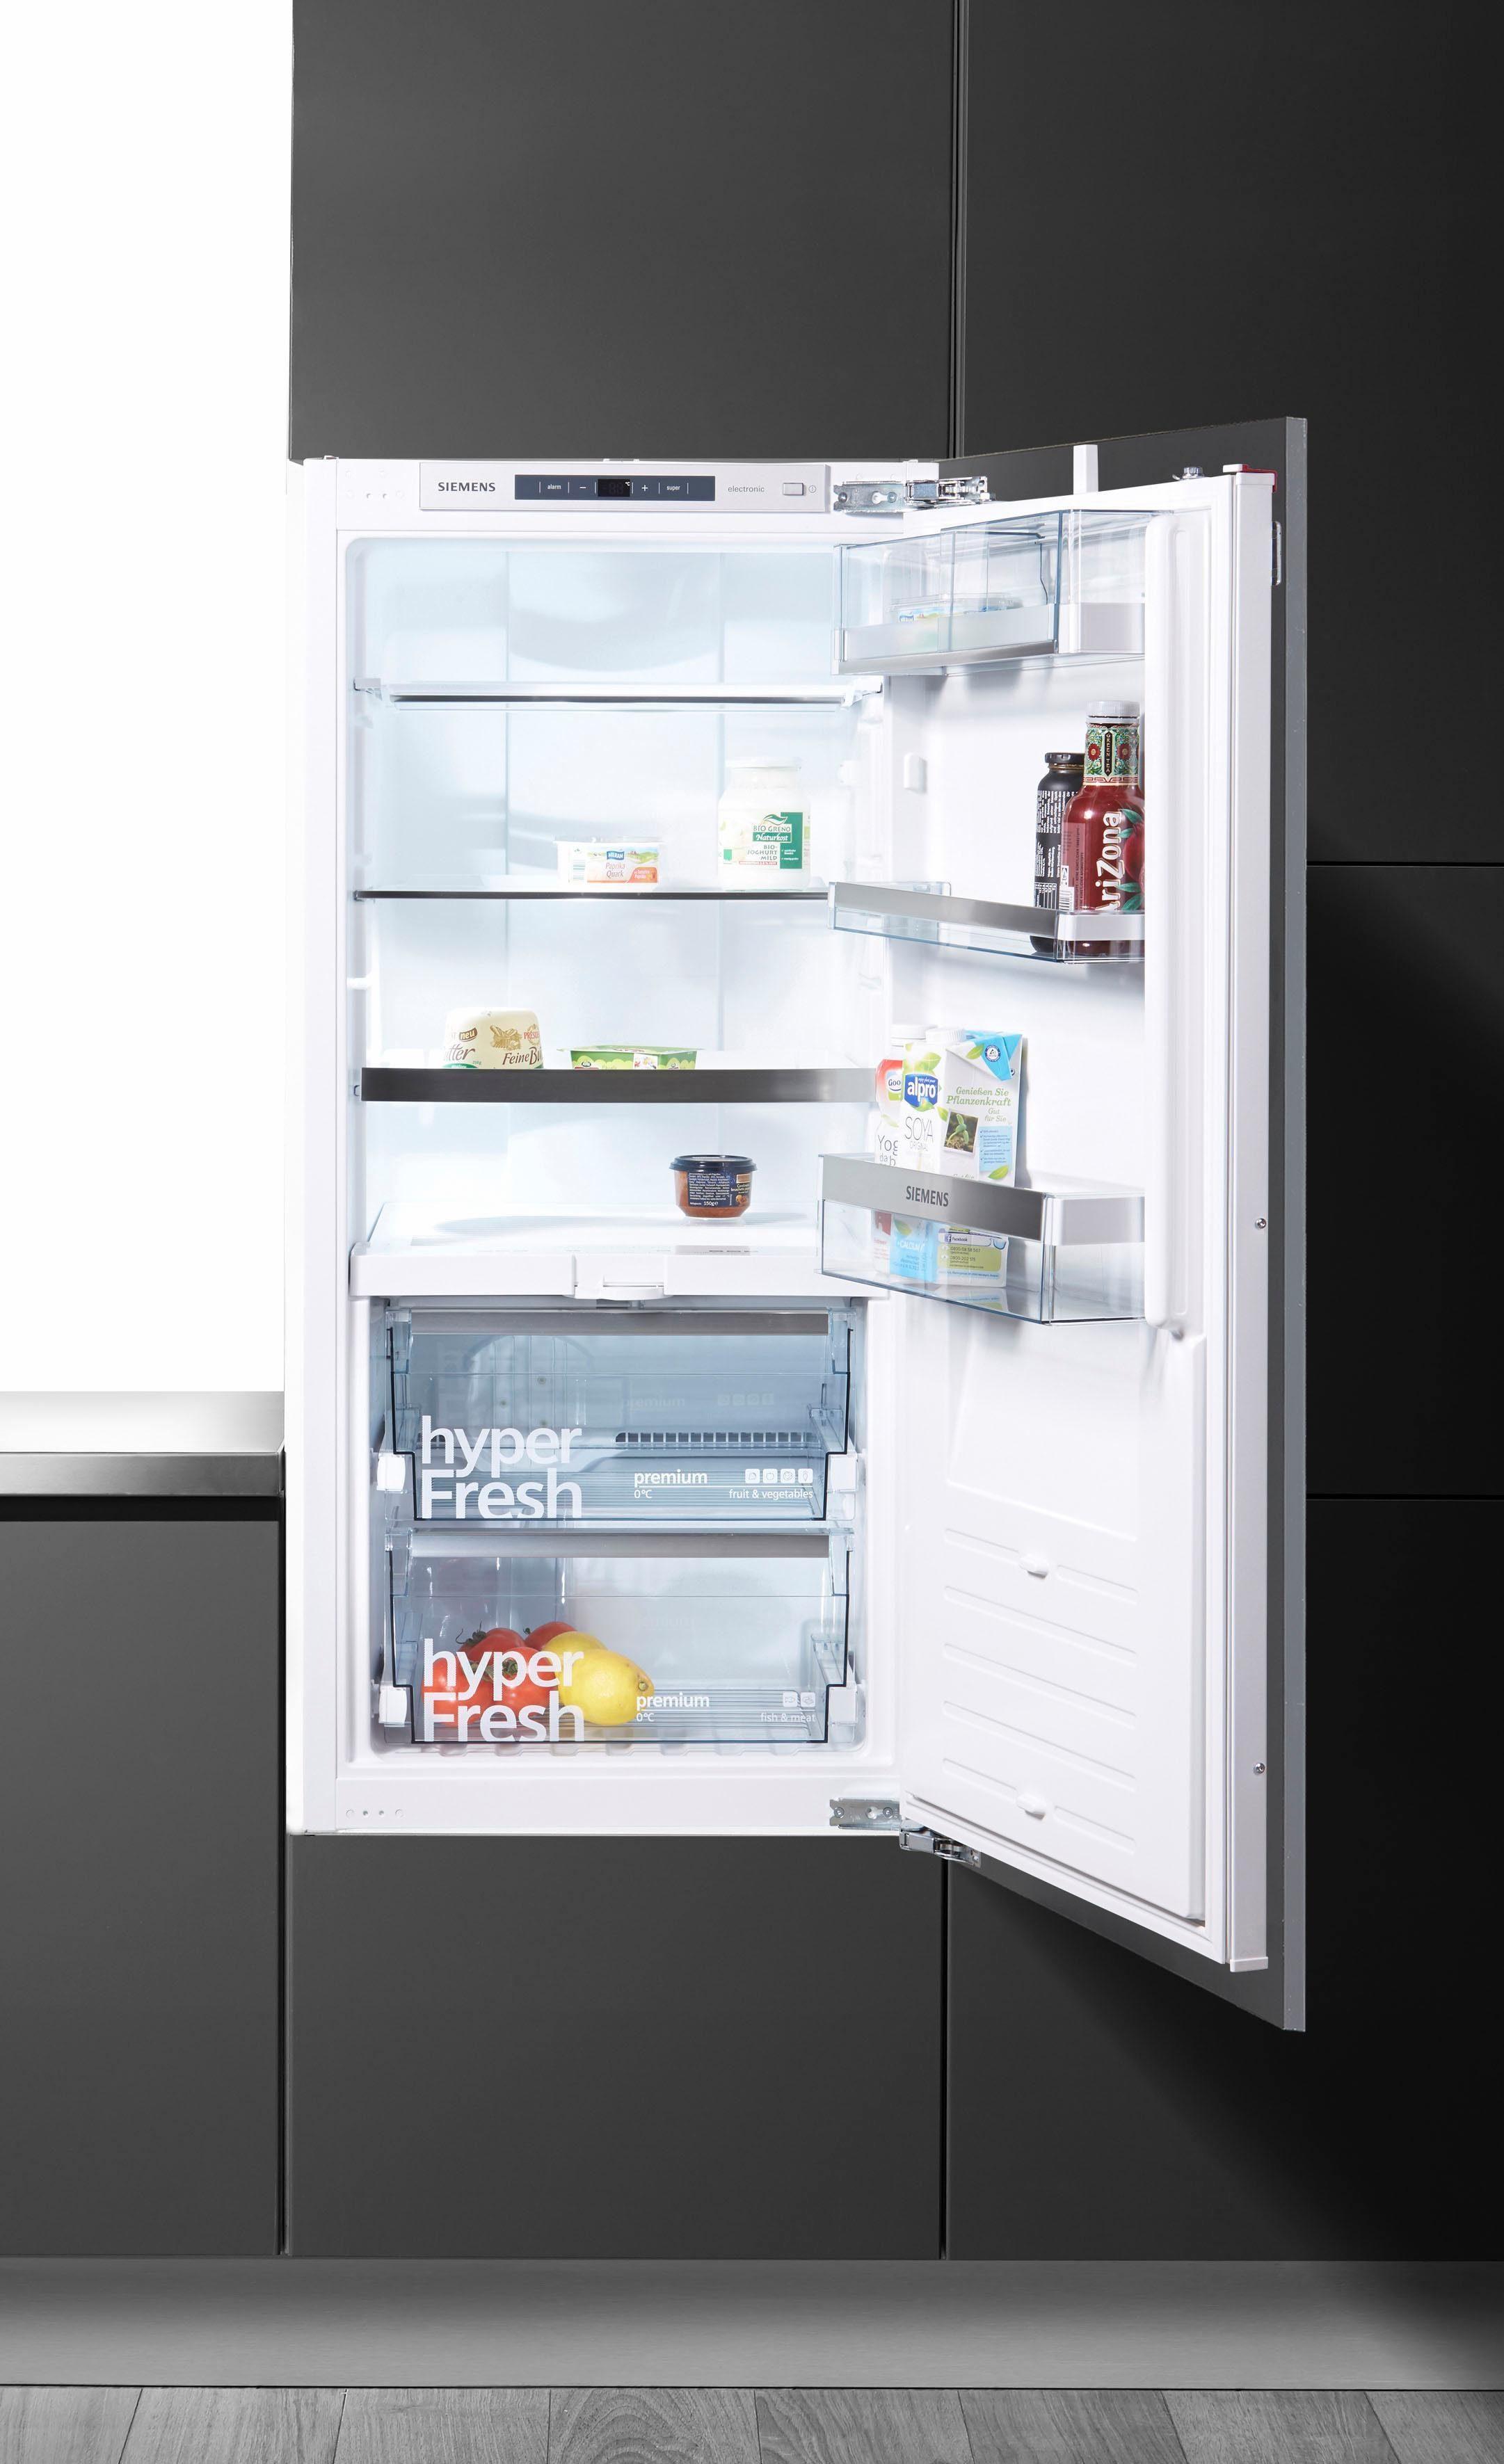 Siemens Einbau-Kühlautomat KI41FAD40, Energieklasse A+++, 122,1 cm hoch